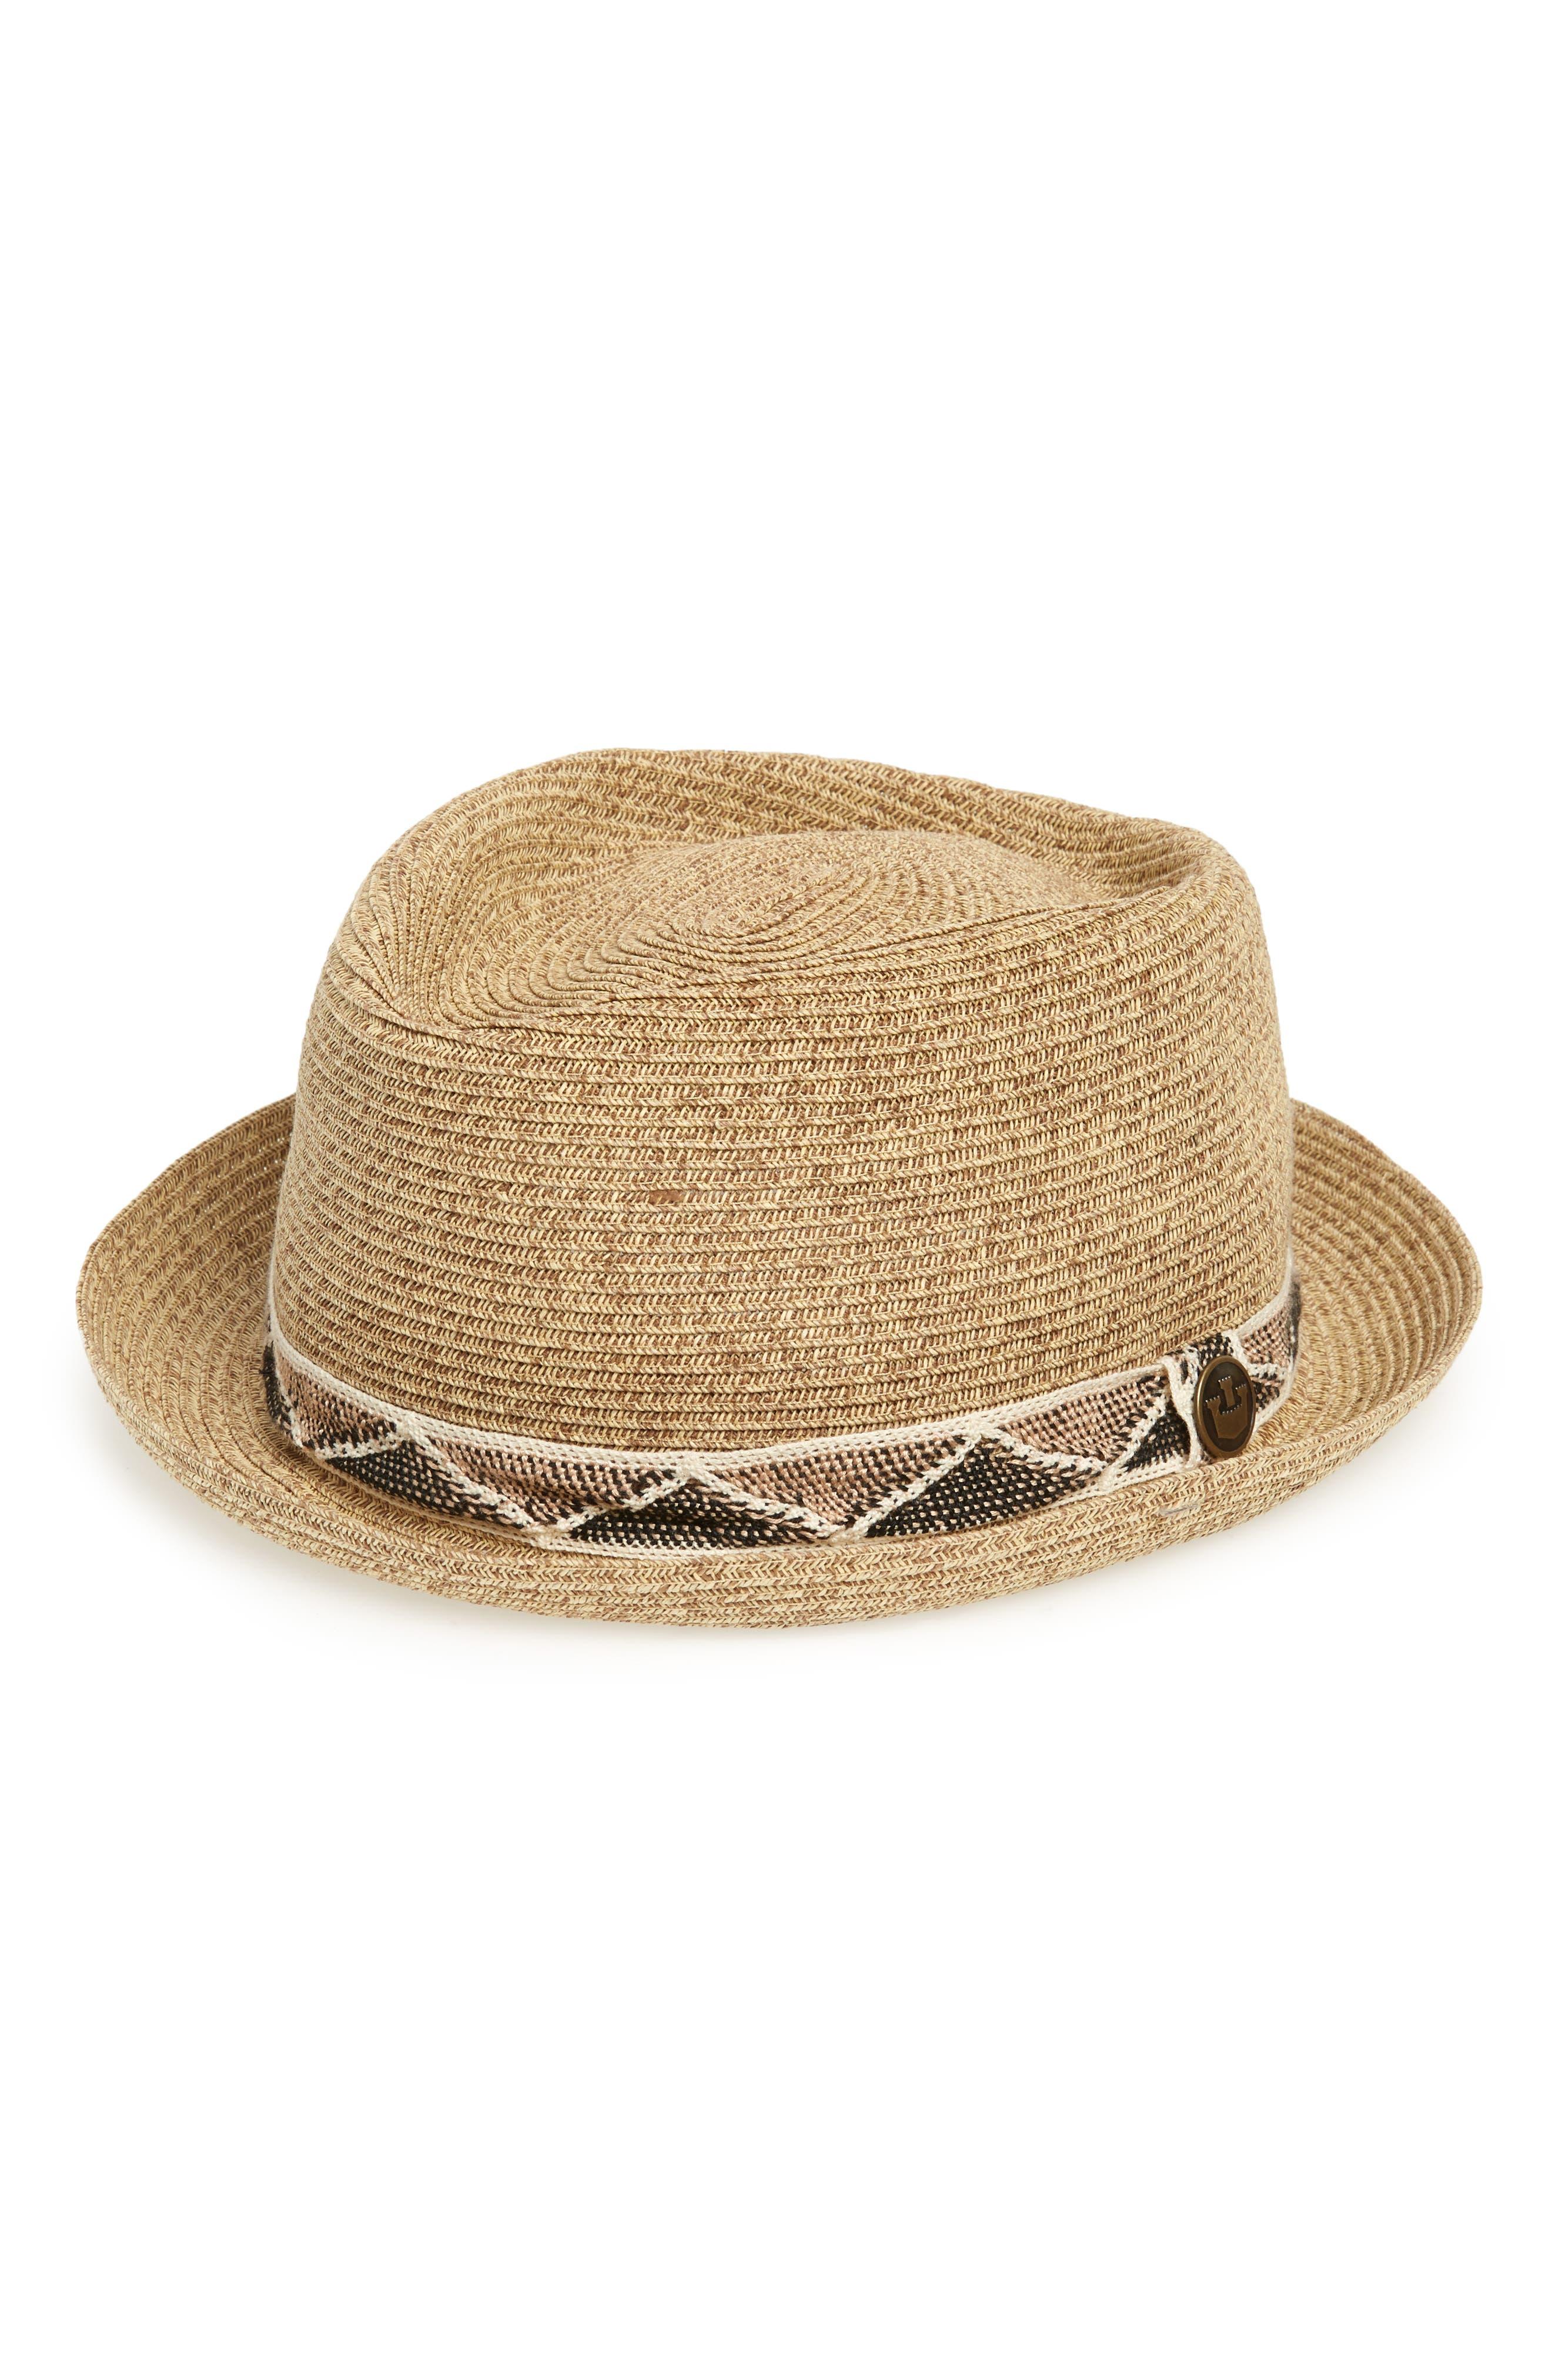 Goorin Brothers Albuquerque Straw Hat